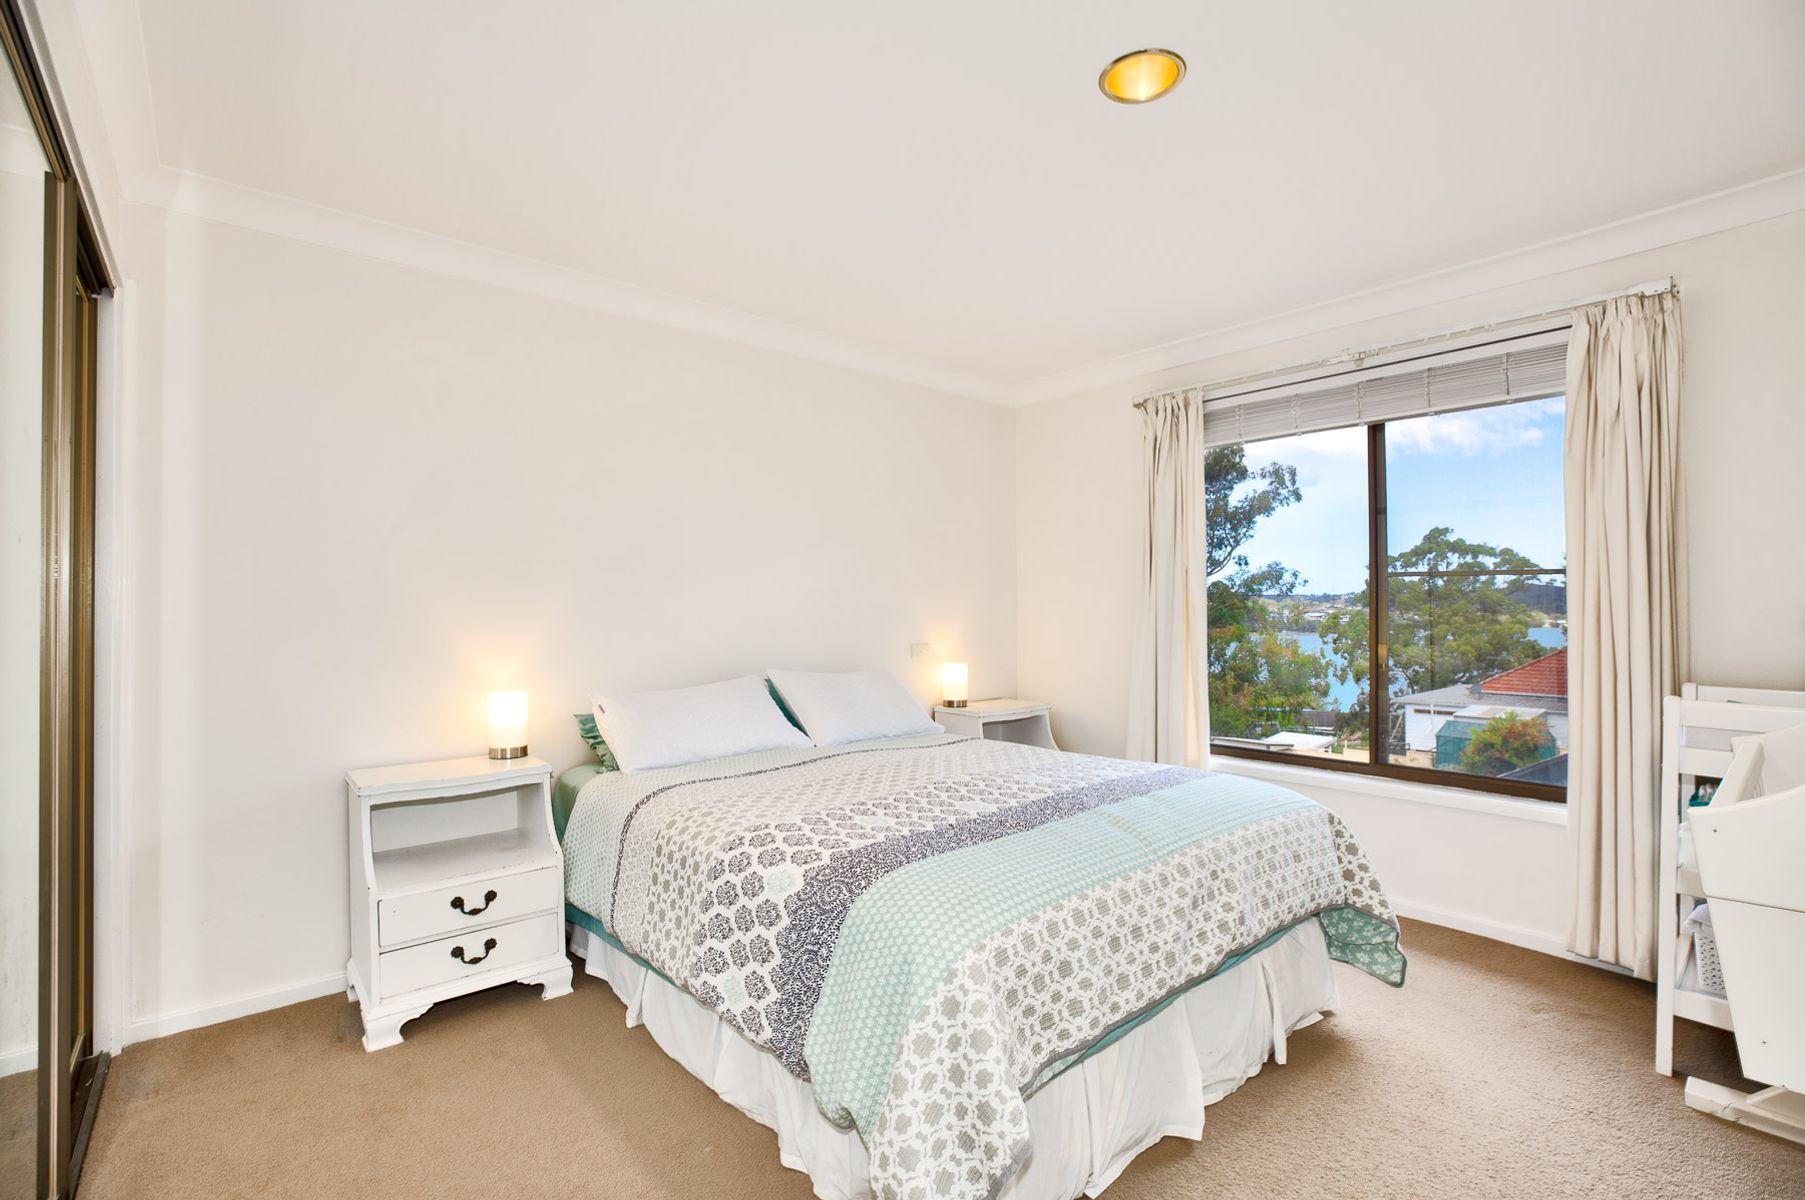 6 Hibiscus Close, Speers Point, NSW 2284